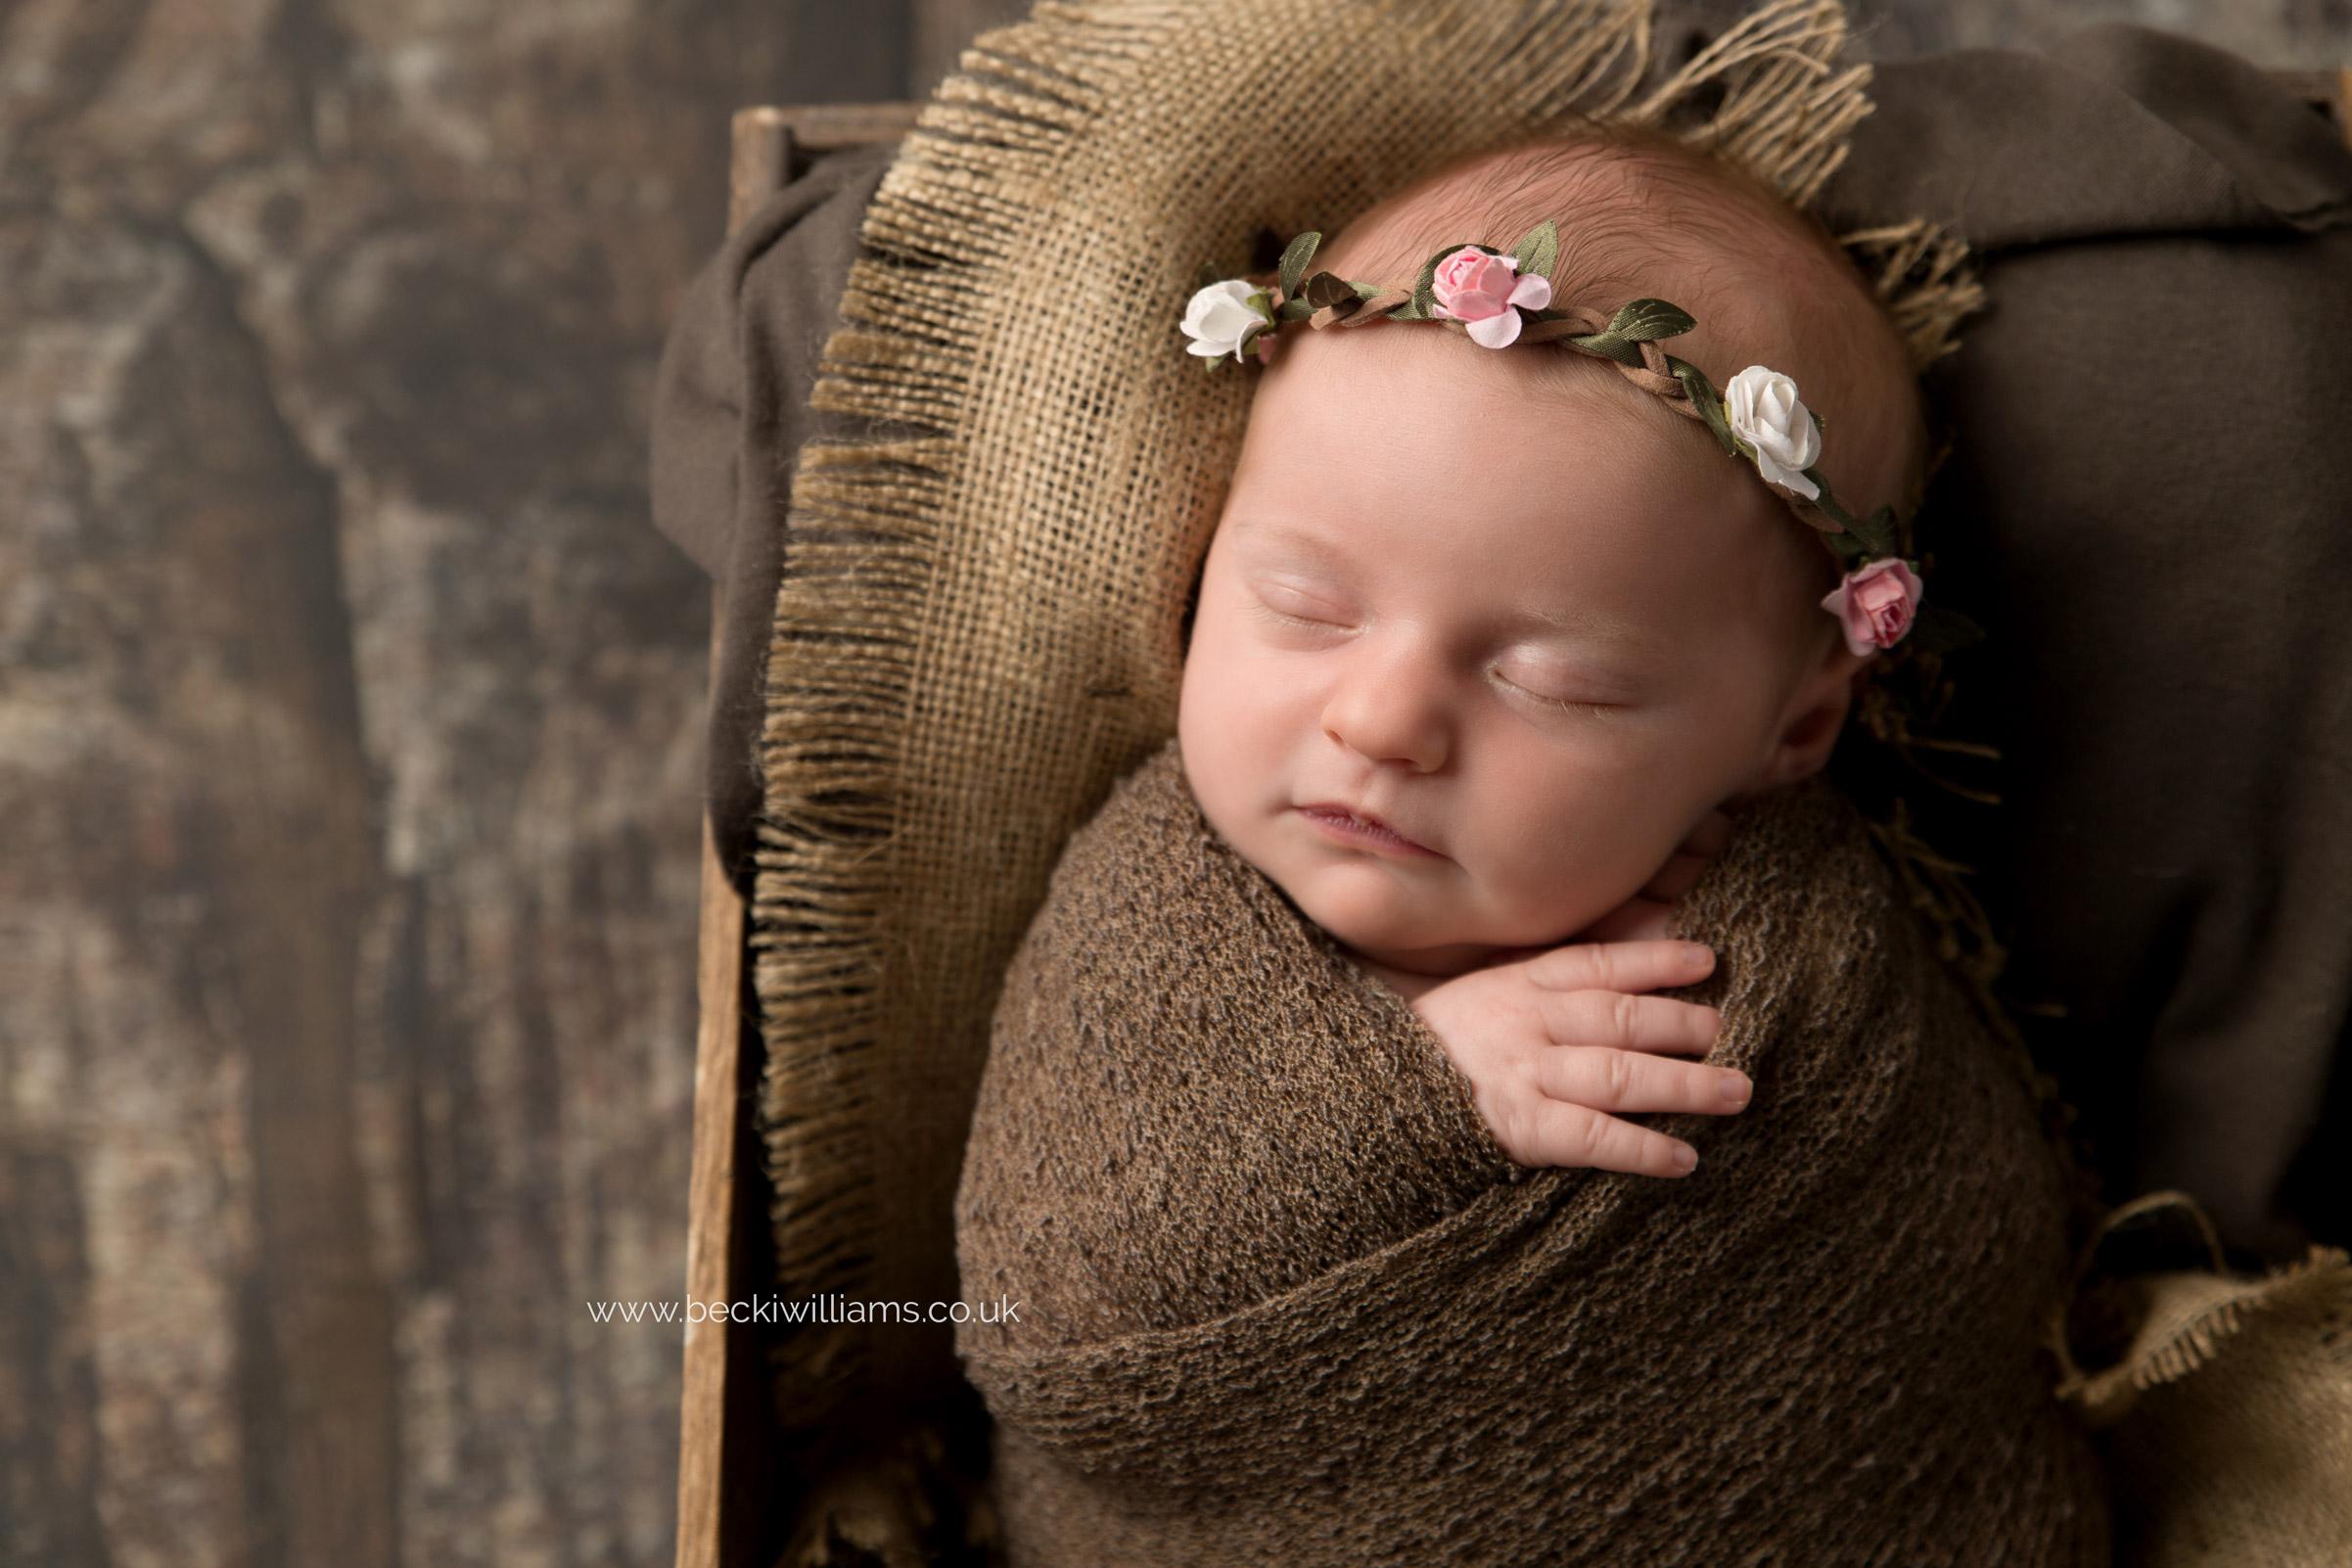 newborn-photography-st-albans-cute-asleep-headband.jpg